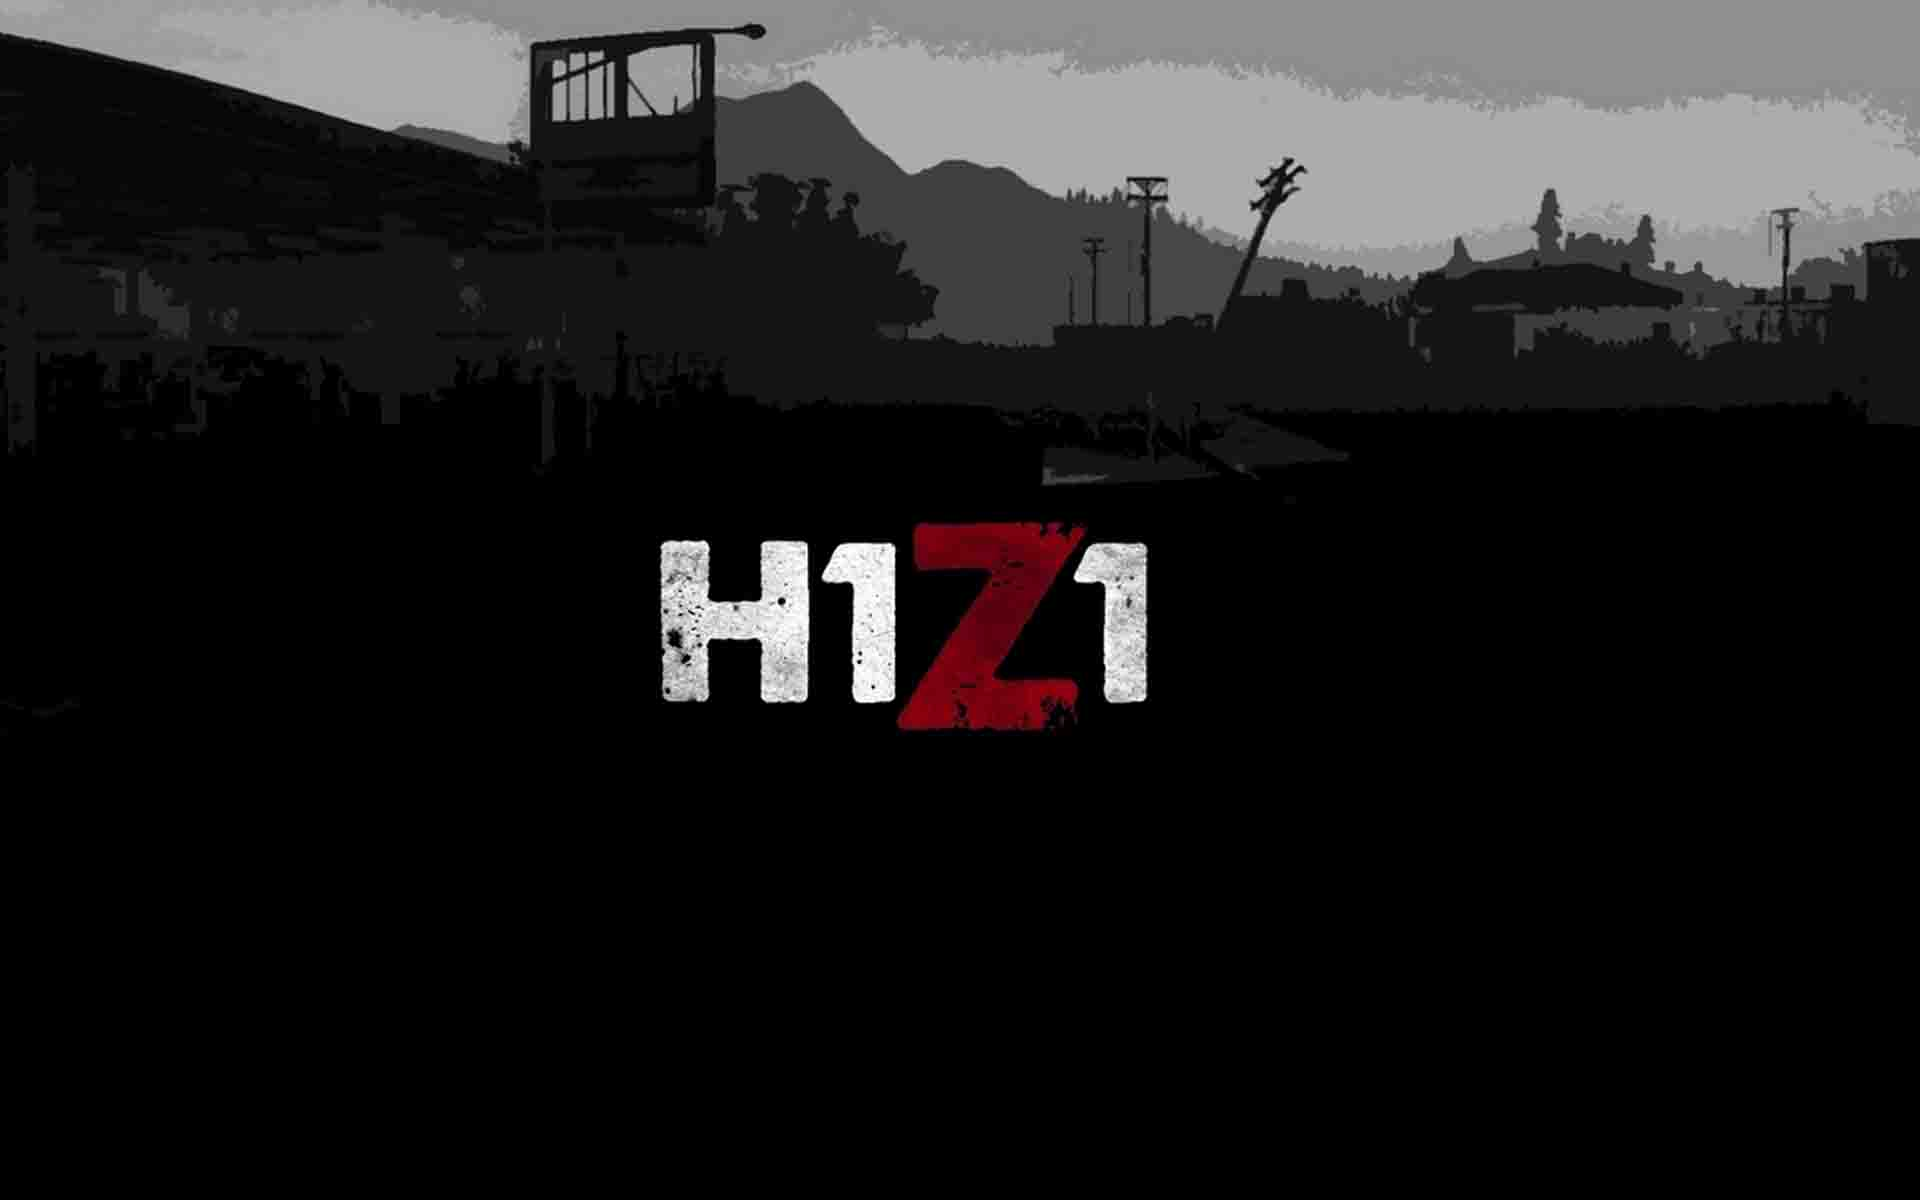 H1z1 Hd Wallpaper H1z1 Wallpaper Hd 259675 Hd